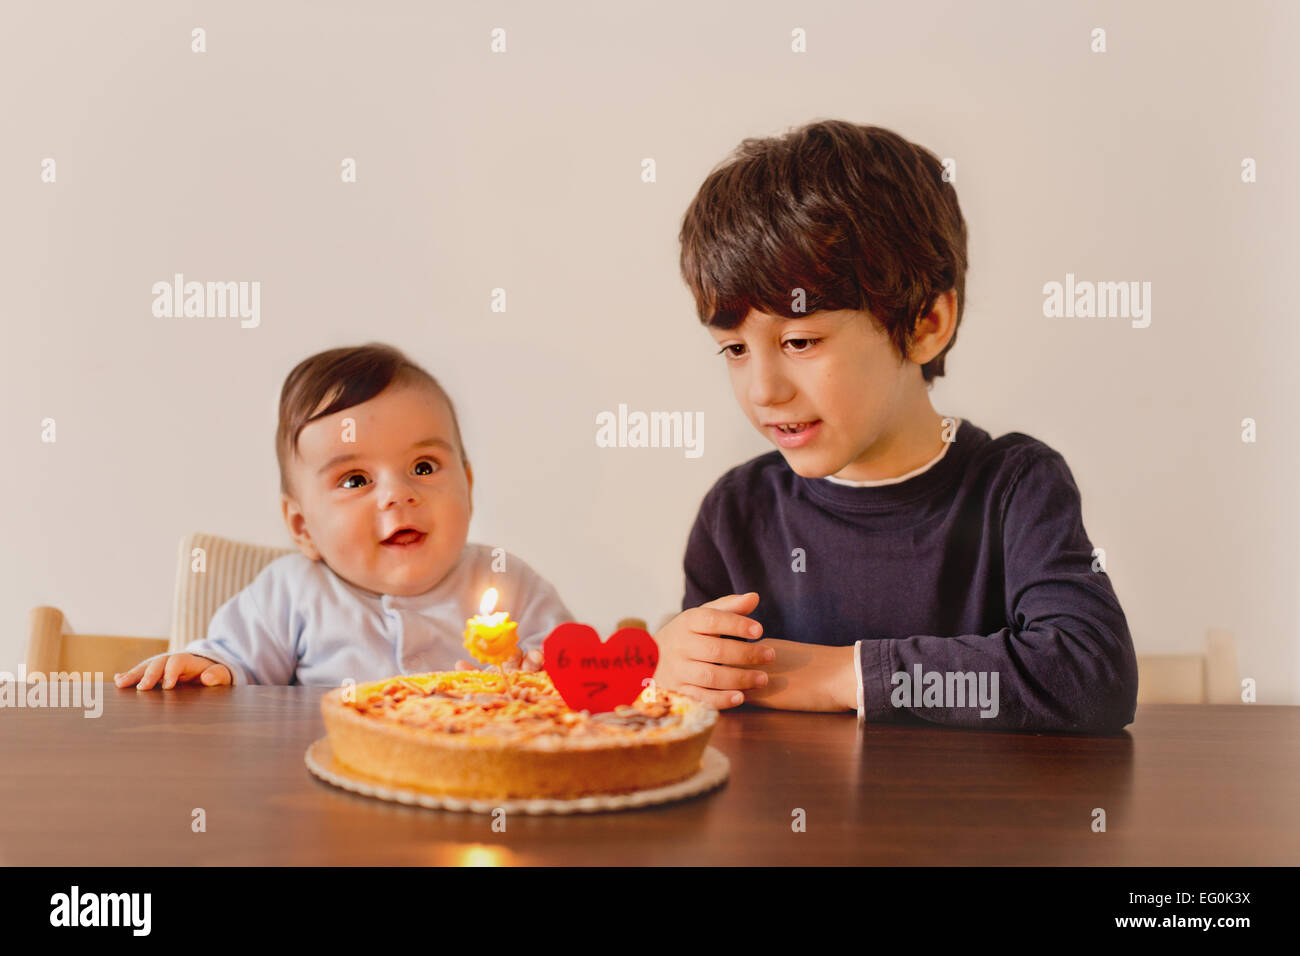 Siblings (6-12 months, 4-5) celebrating birthday - Stock Image